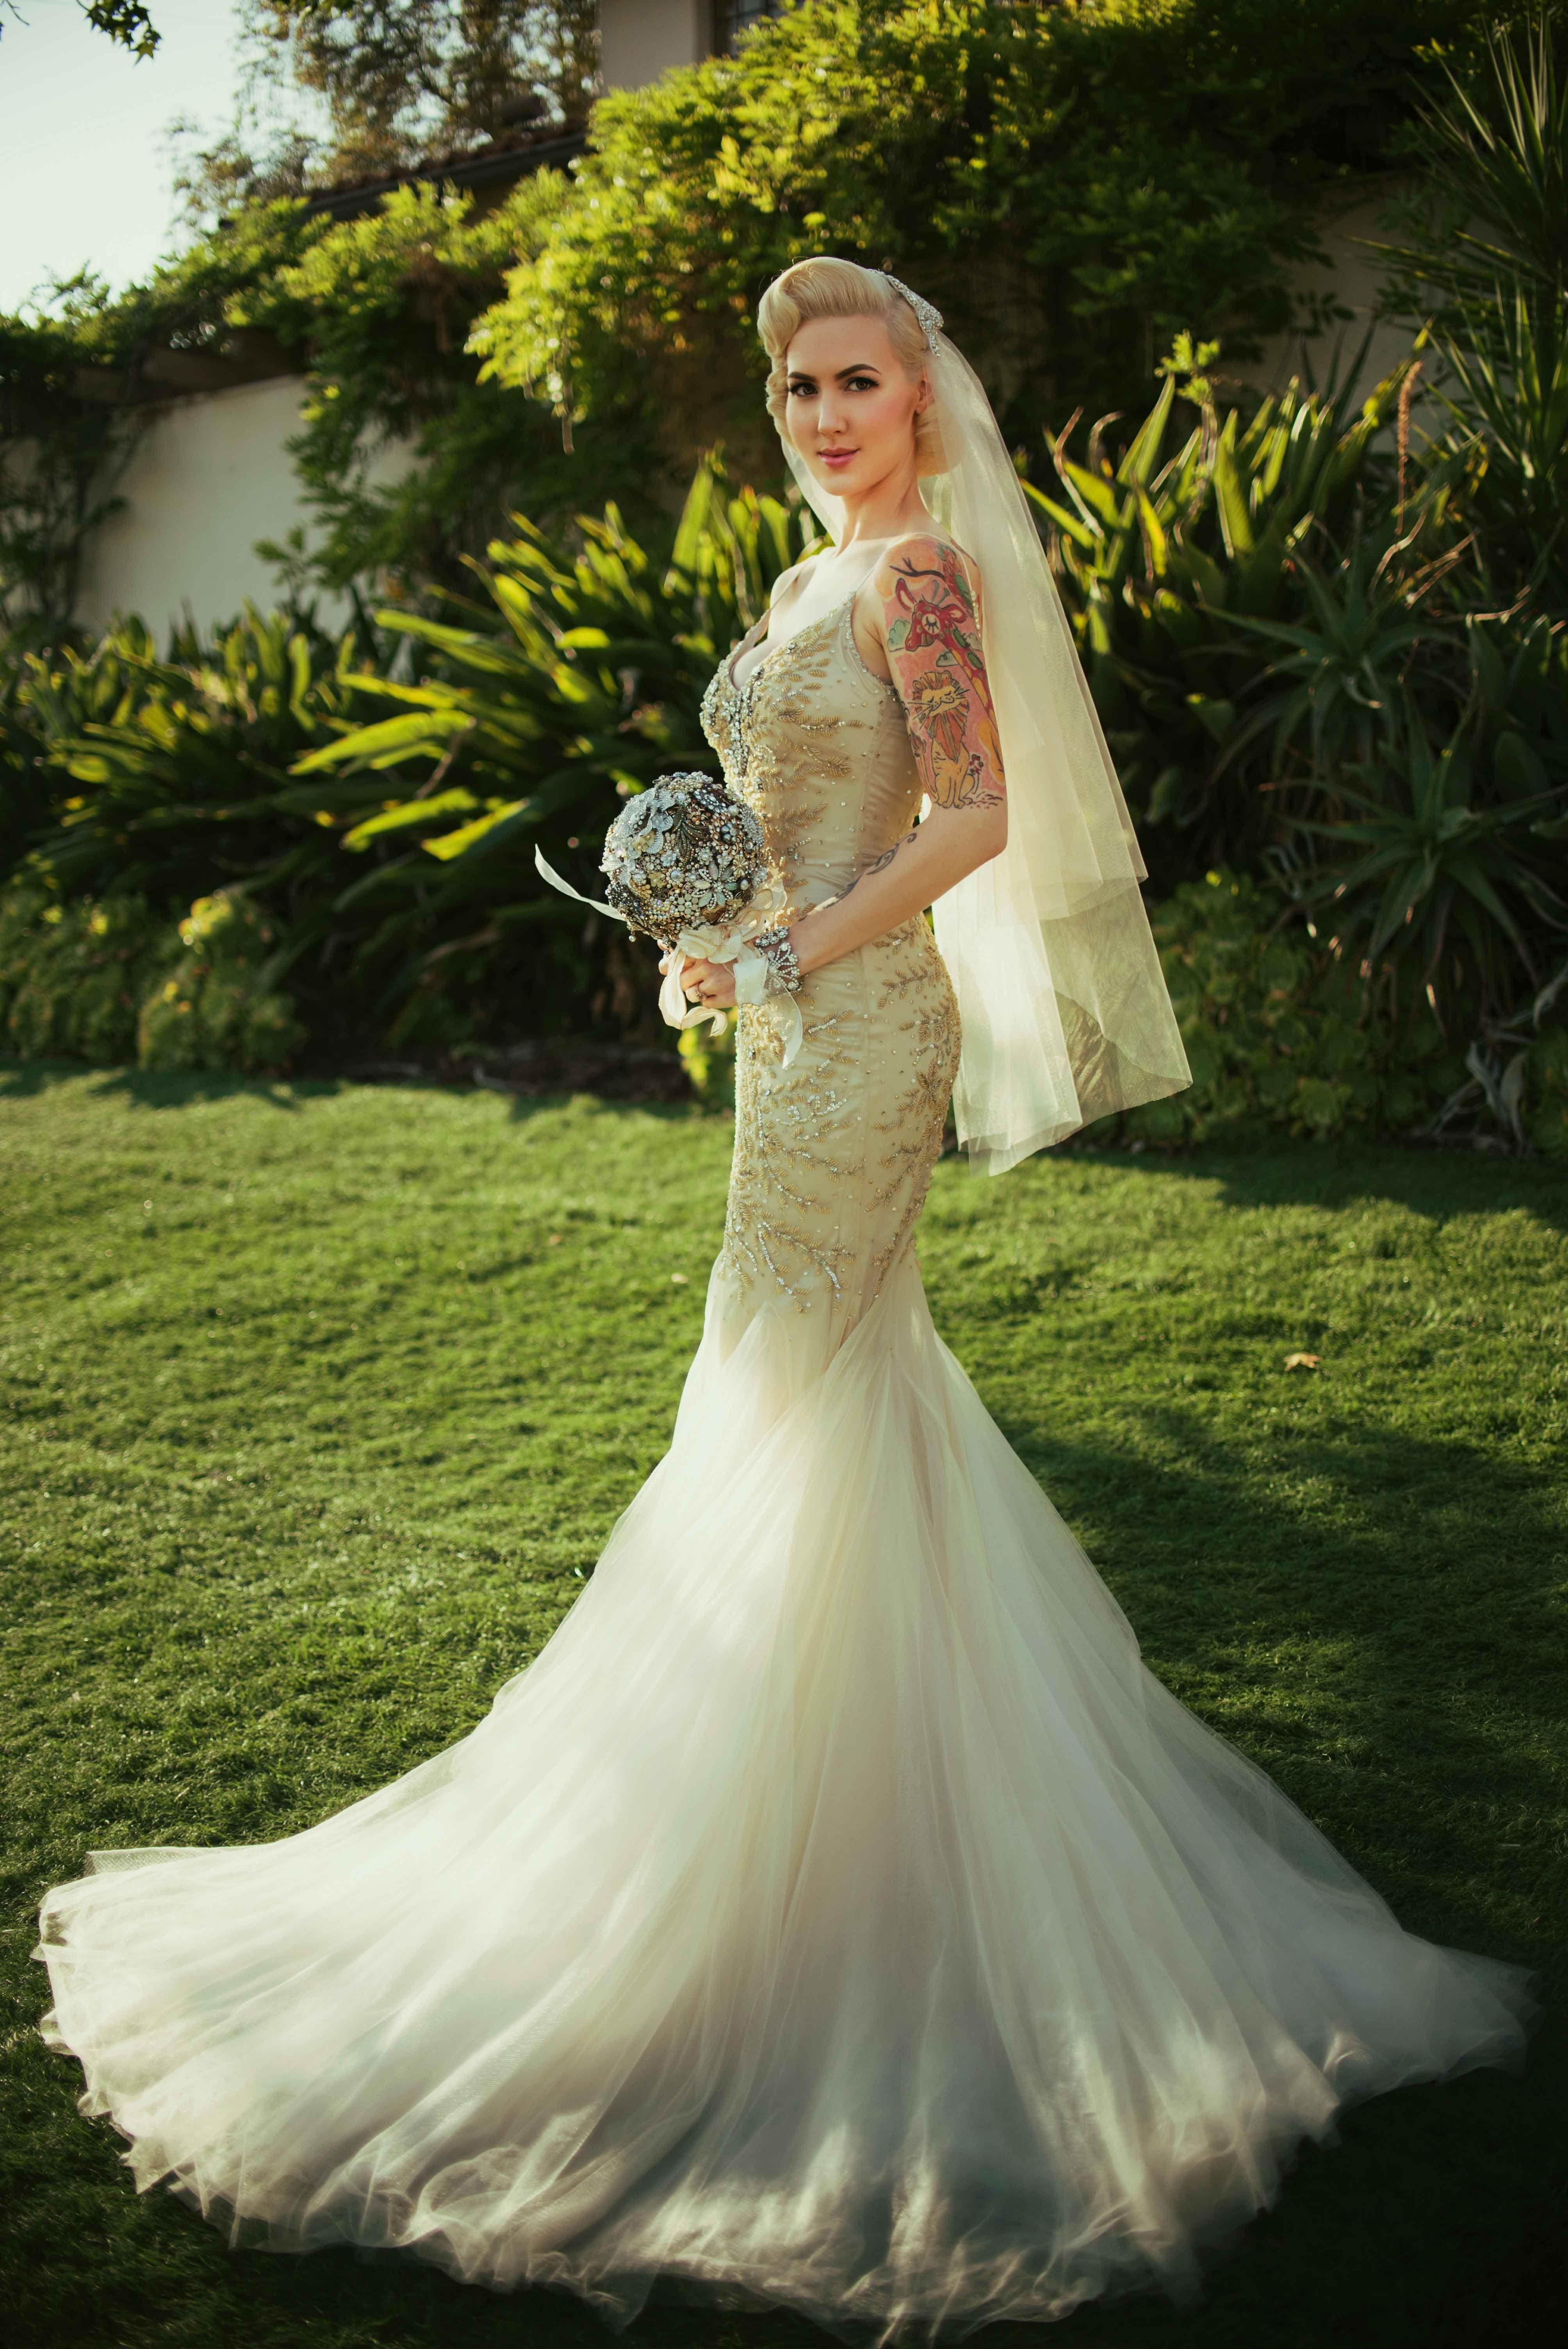 discover vintage & diy wedding ideas from miss rockabilly